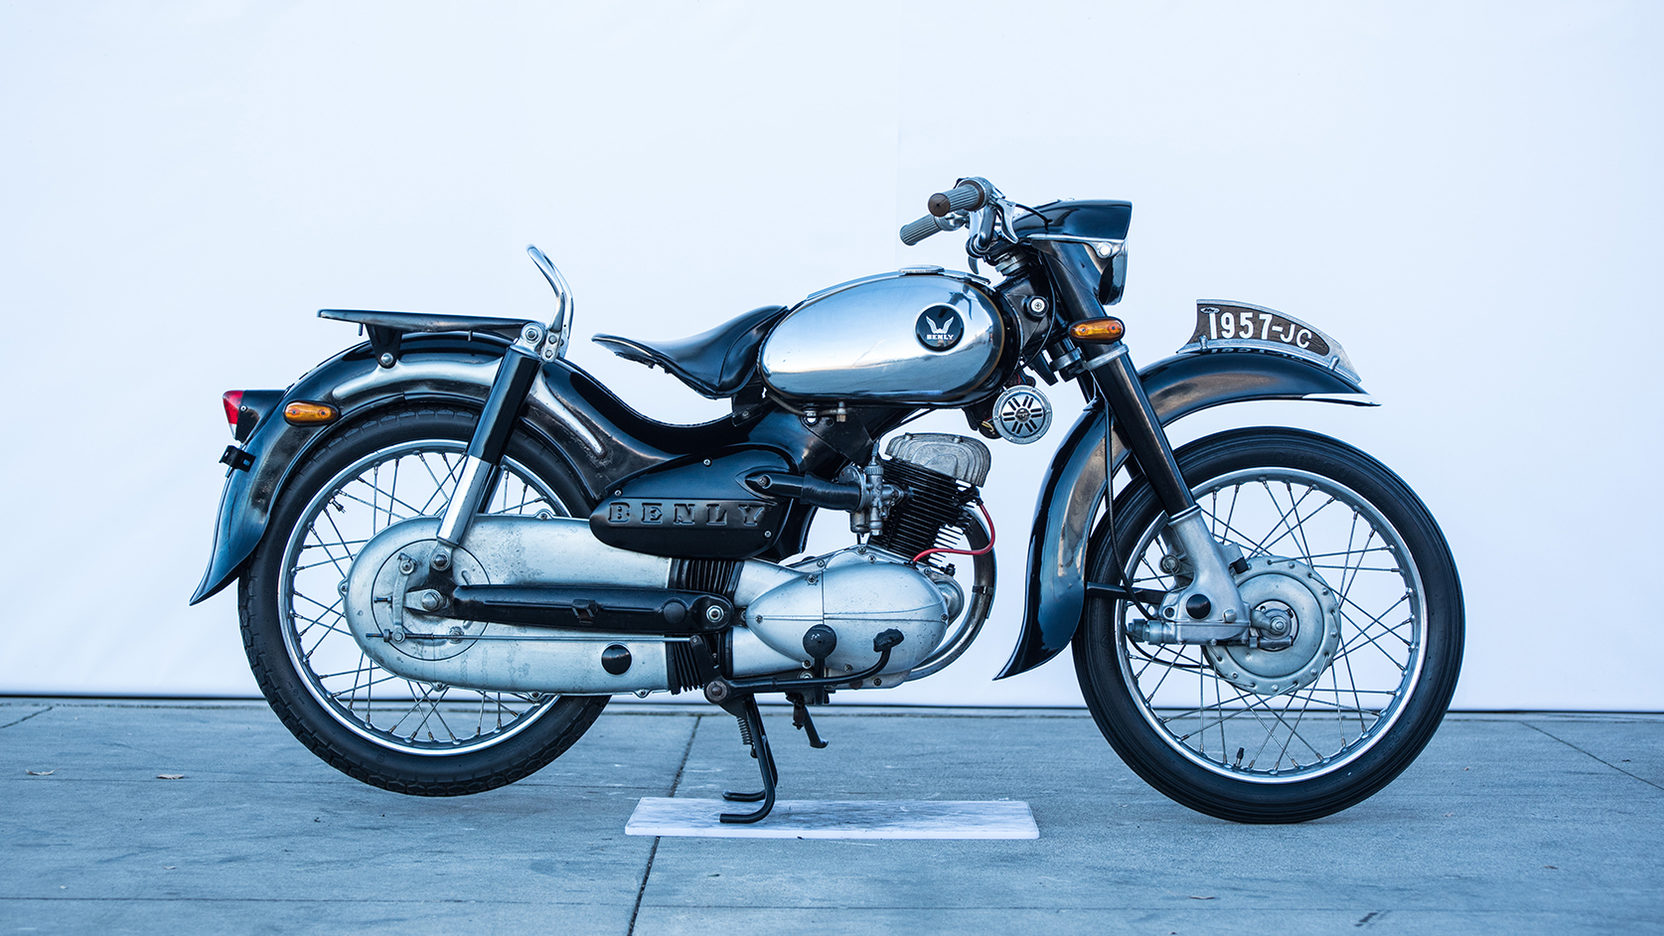 1958 Honda Benly Motorcycle